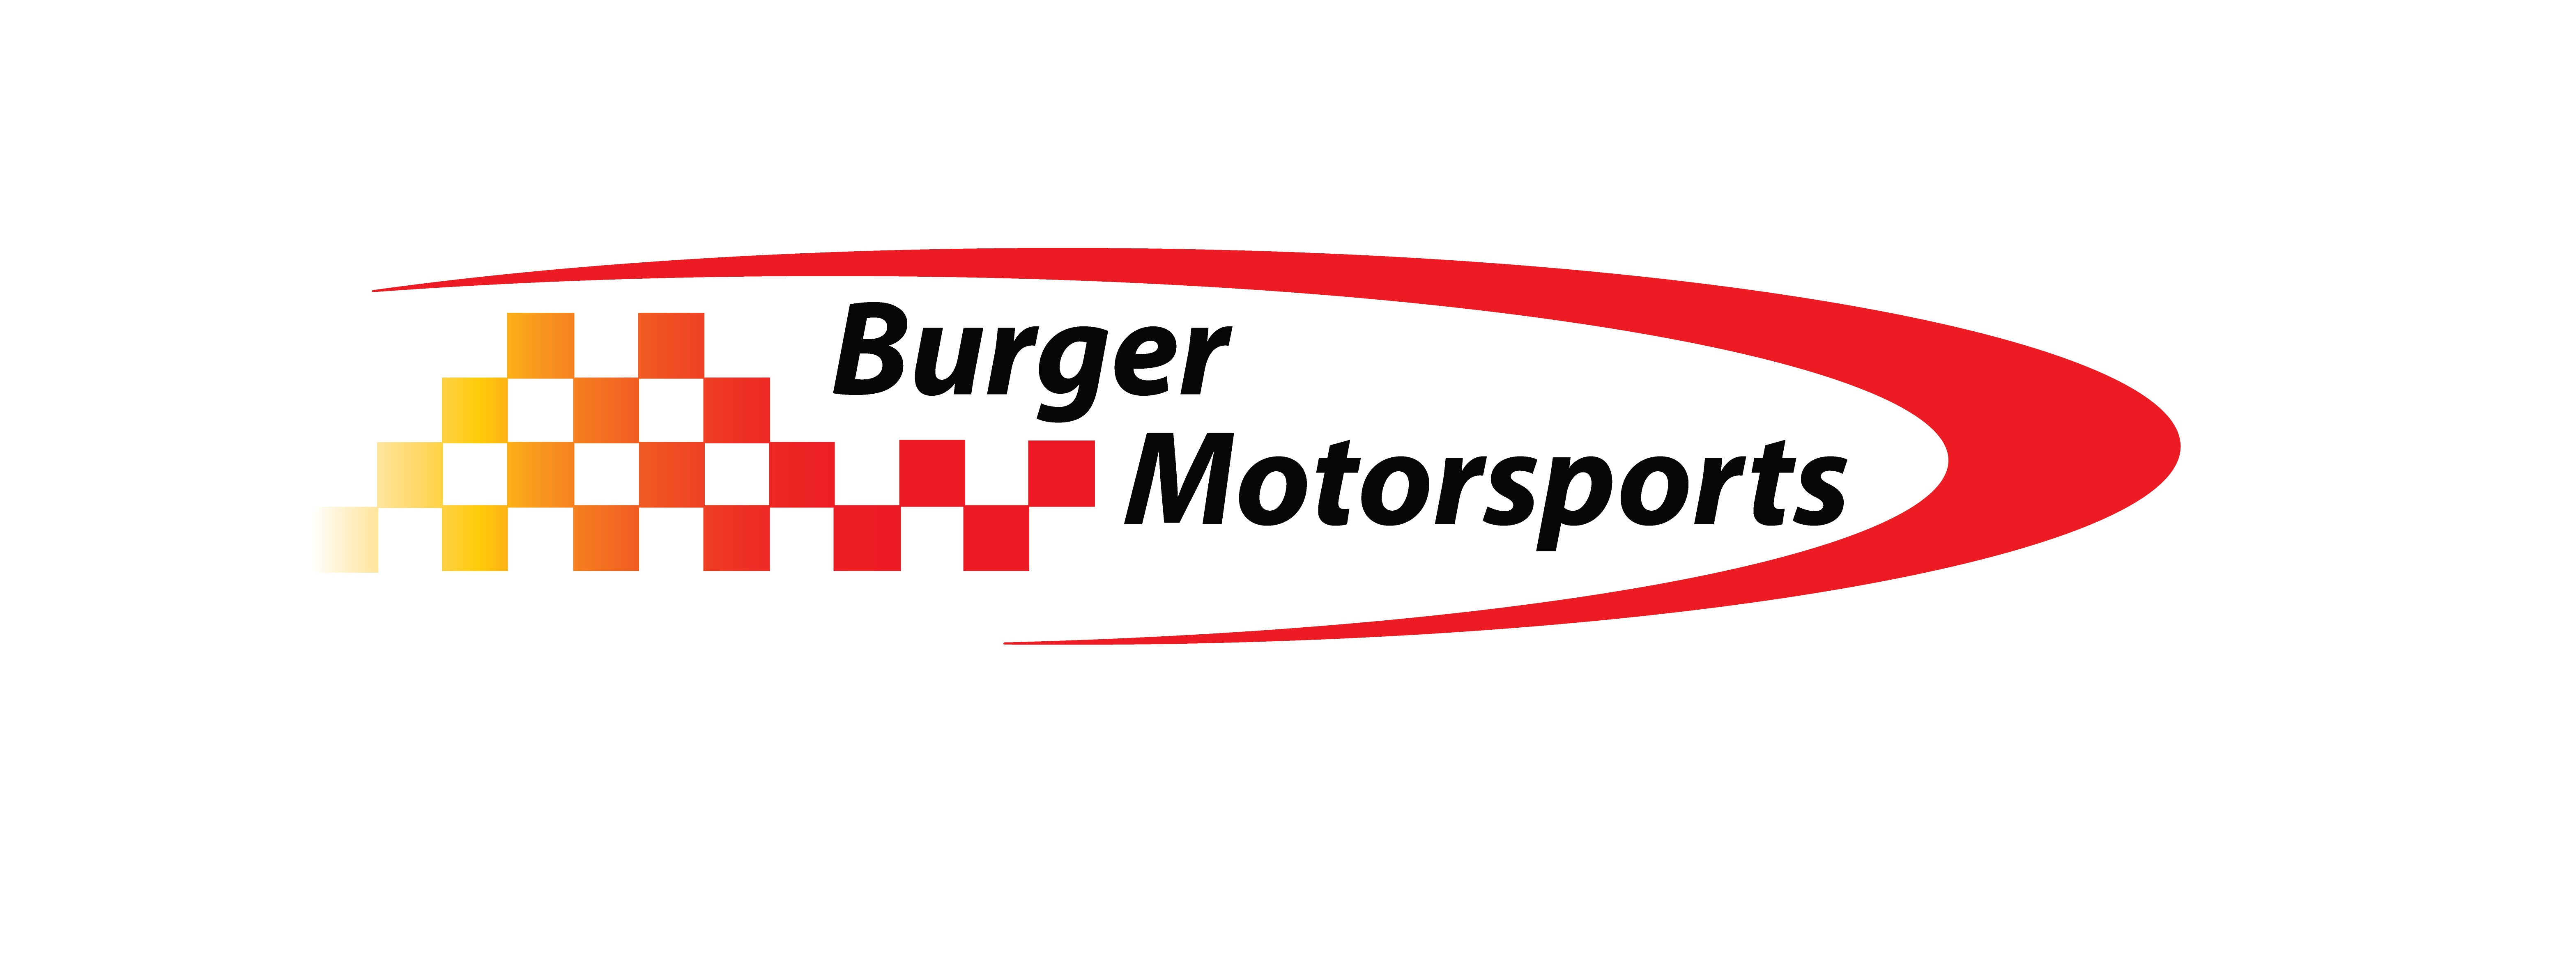 Burger Motorsports, Inc.